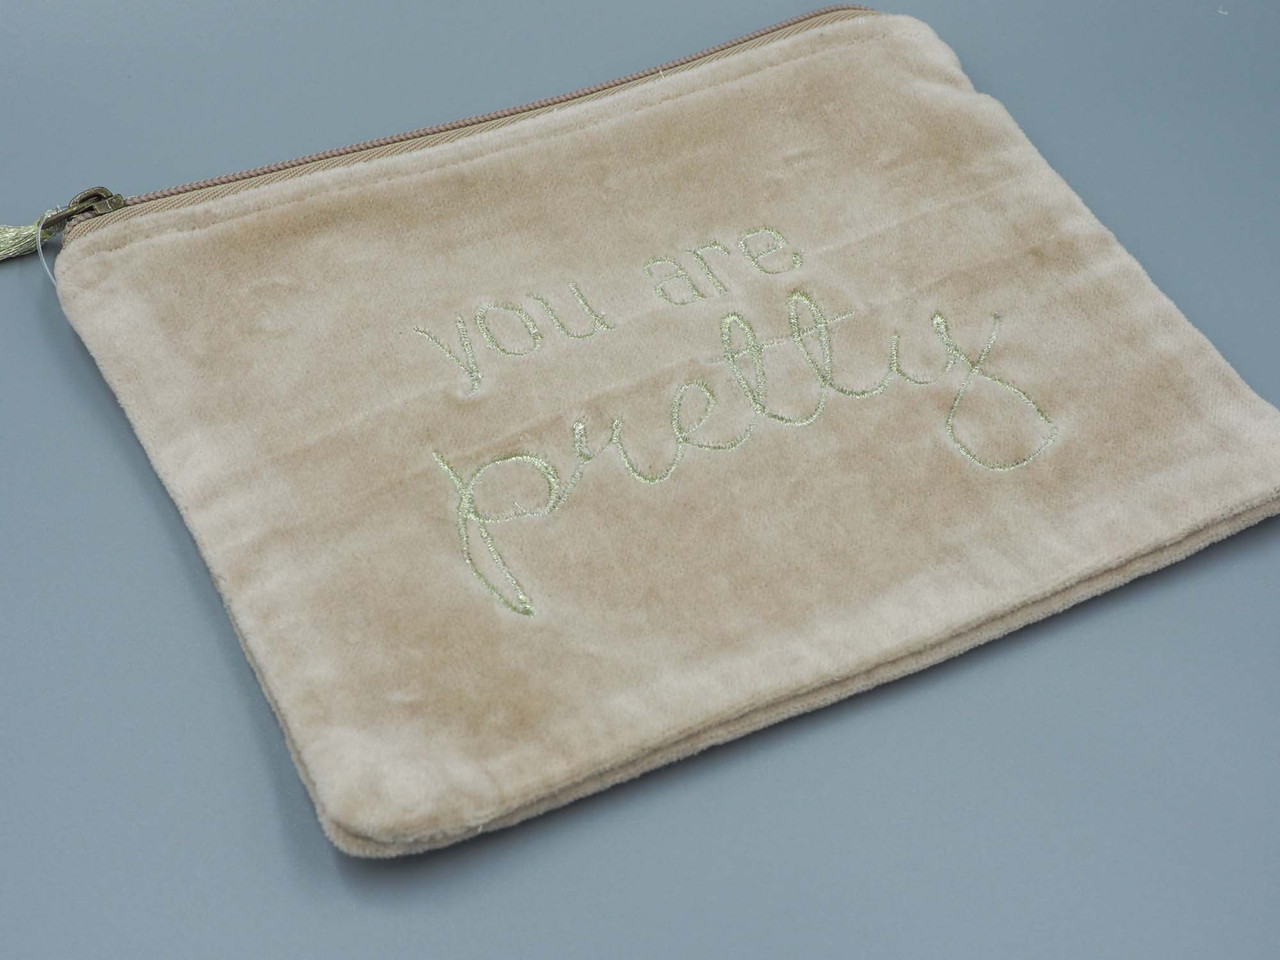 velvet zip pouch